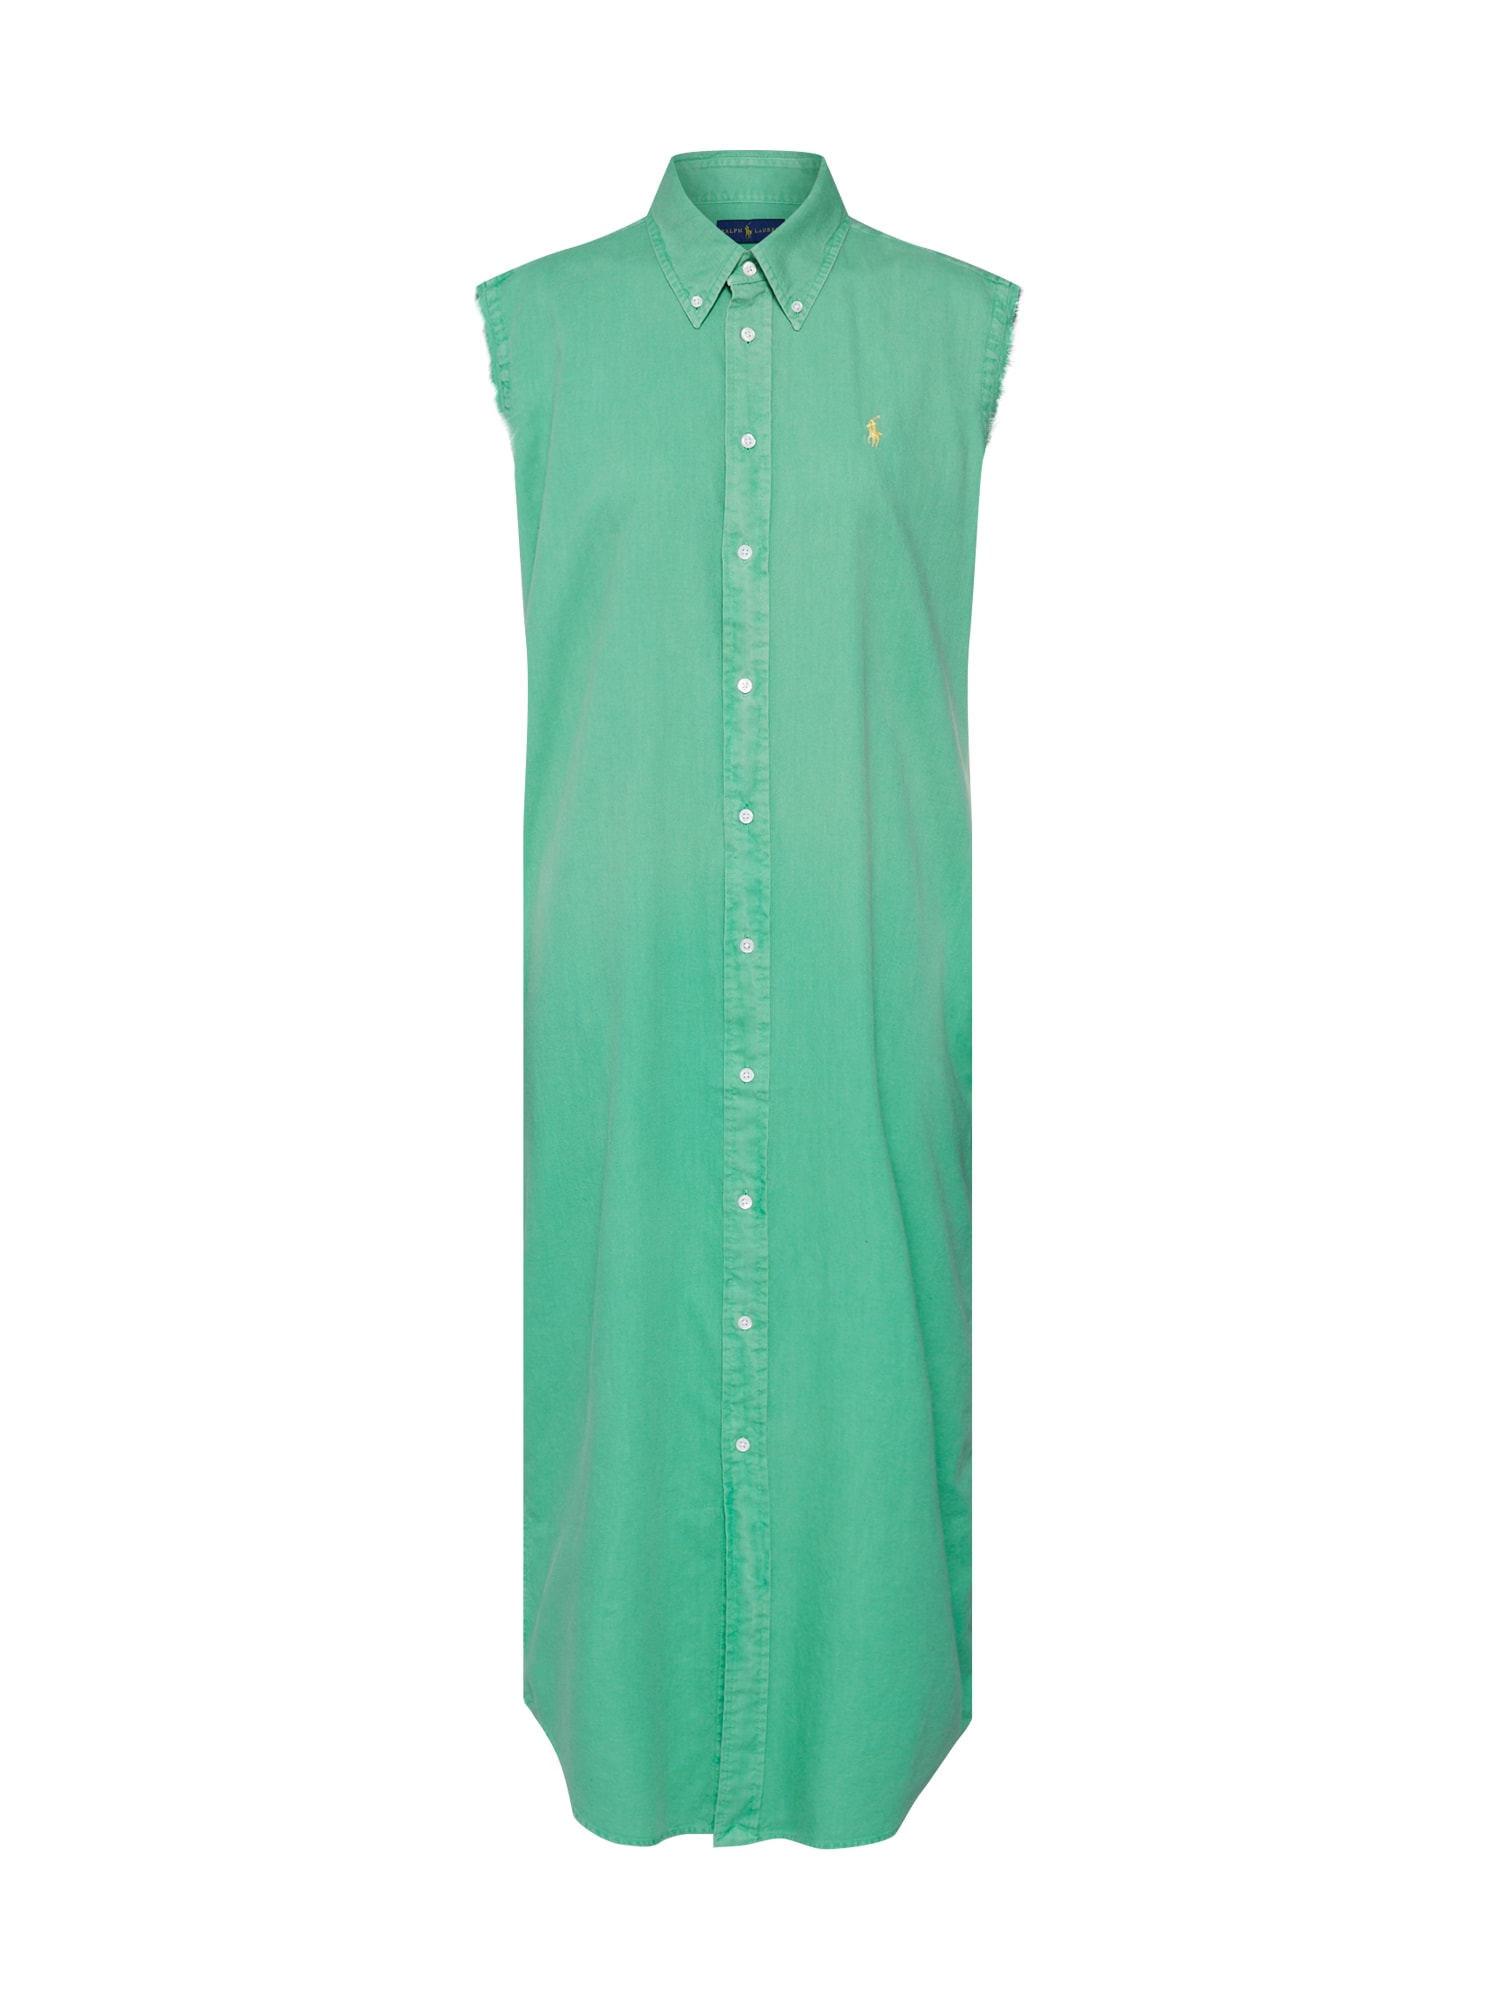 Košilové šaty SL STNFRD DR-SLEEVELESS-CASUAL DRESS zelená POLO RALPH LAUREN